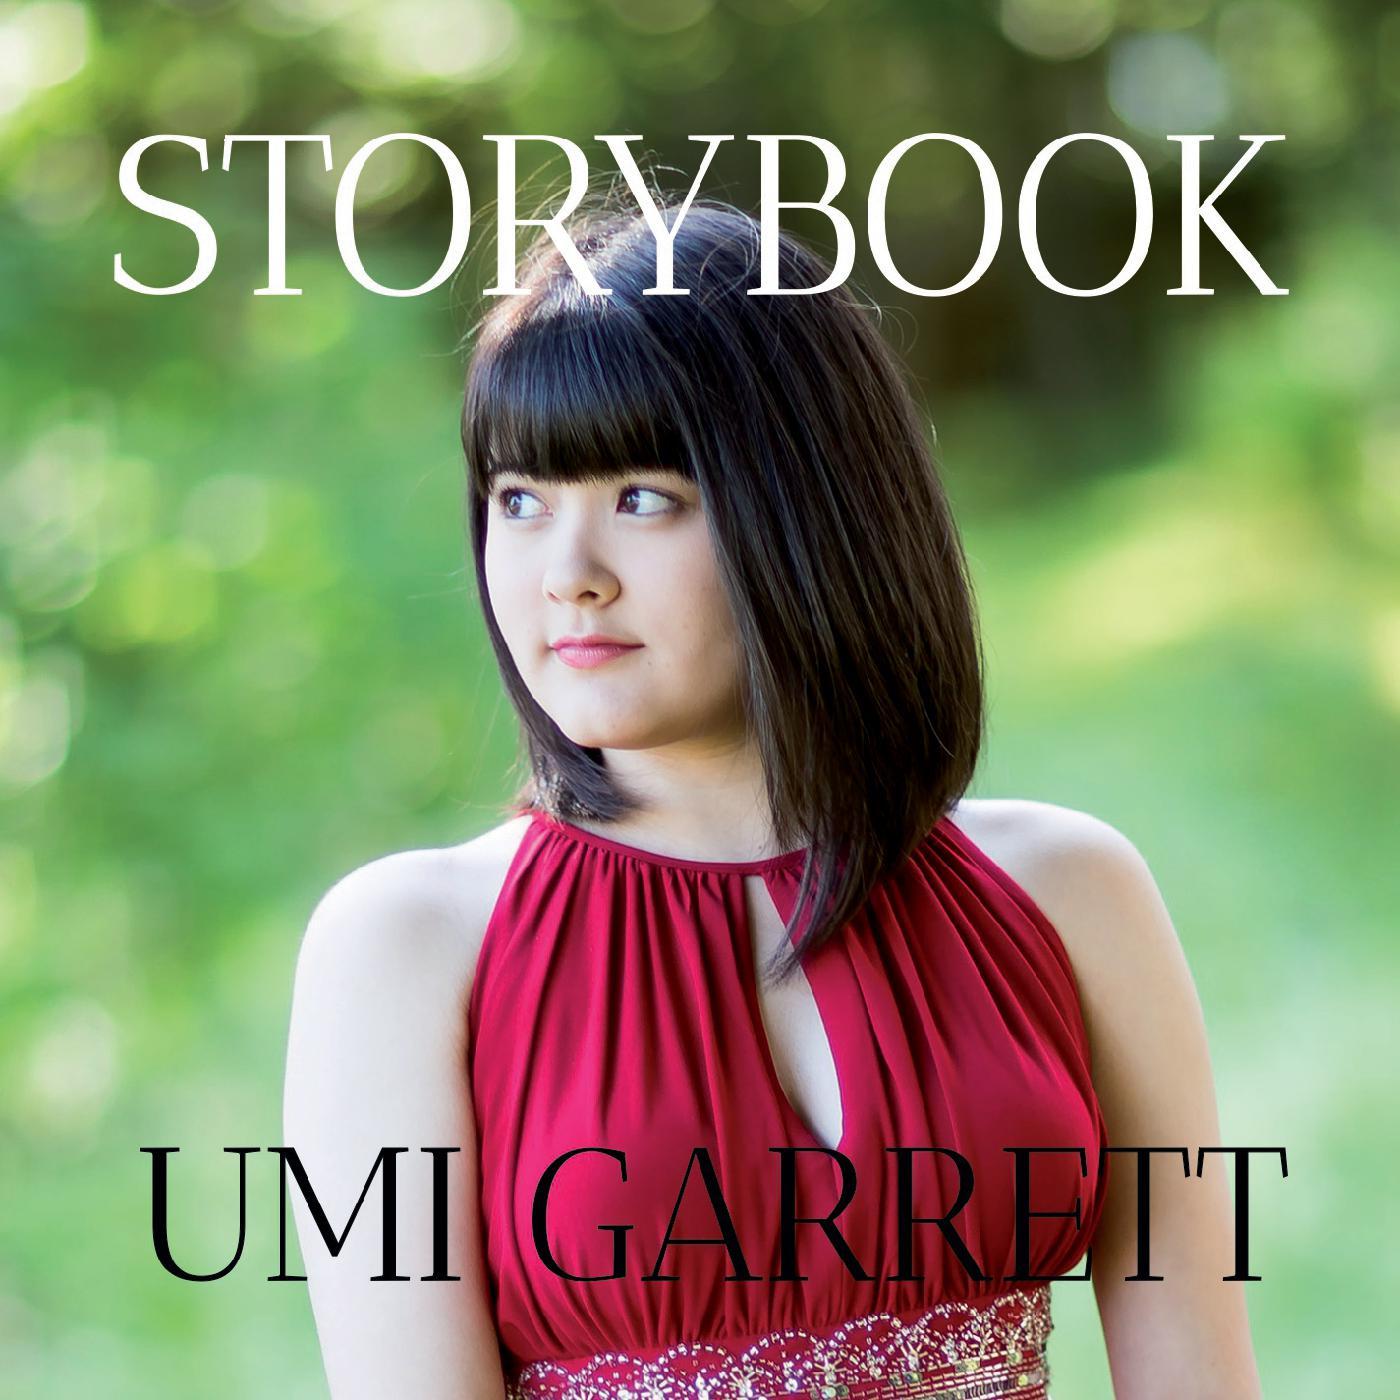 Storybook Cover Image.jpg